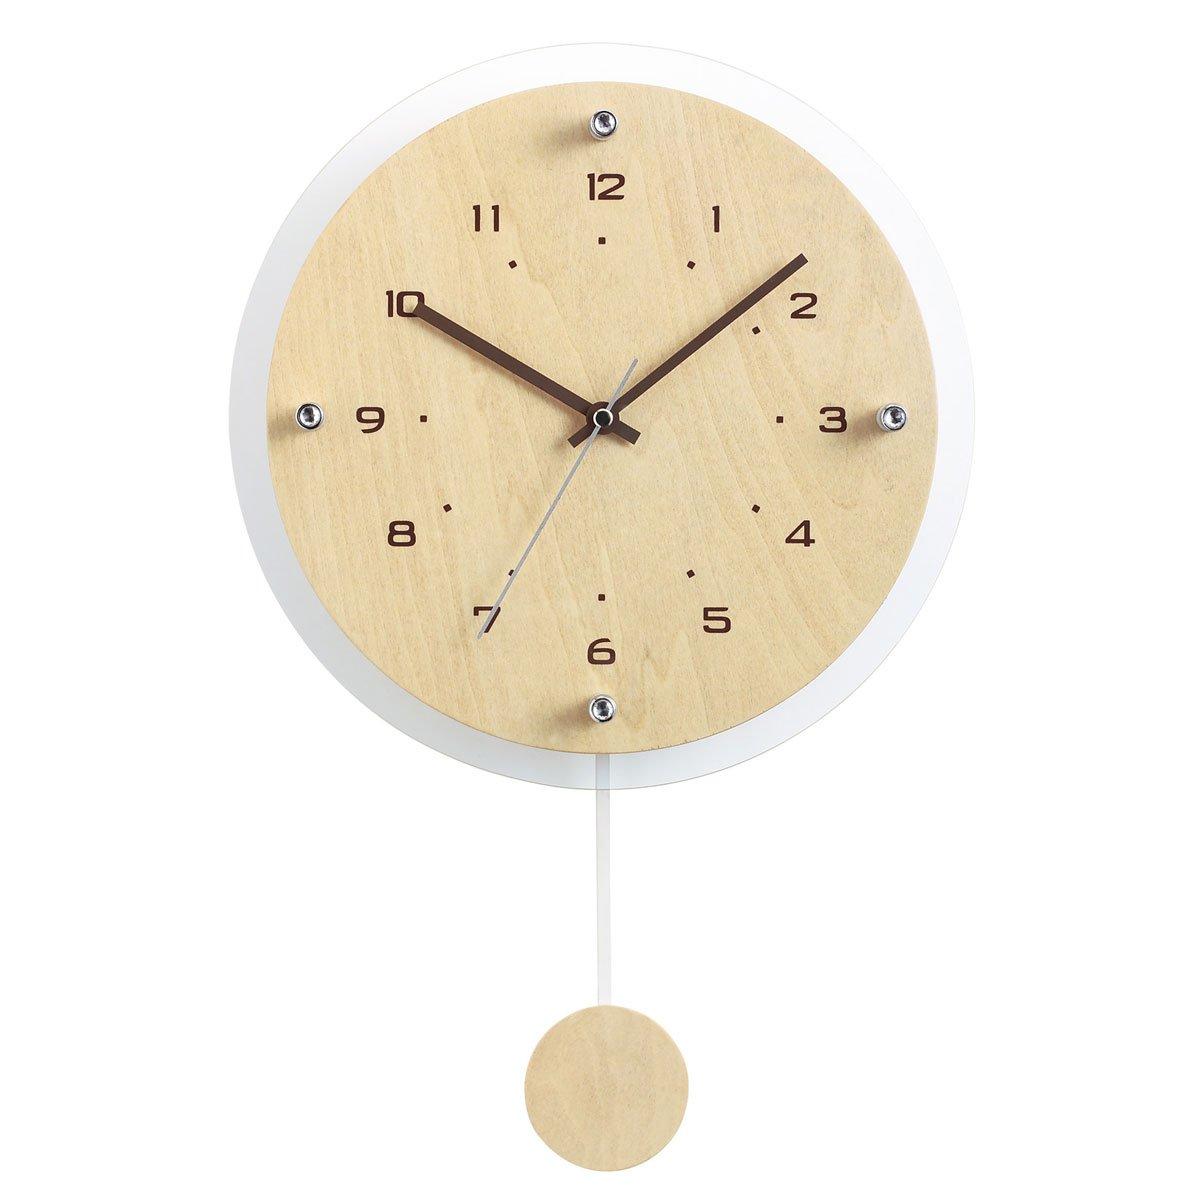 NOA (ノア) 電波時計 ウォールクロック アンティール 振り子時計 W-473 N ナチュラル B004GJUSI0